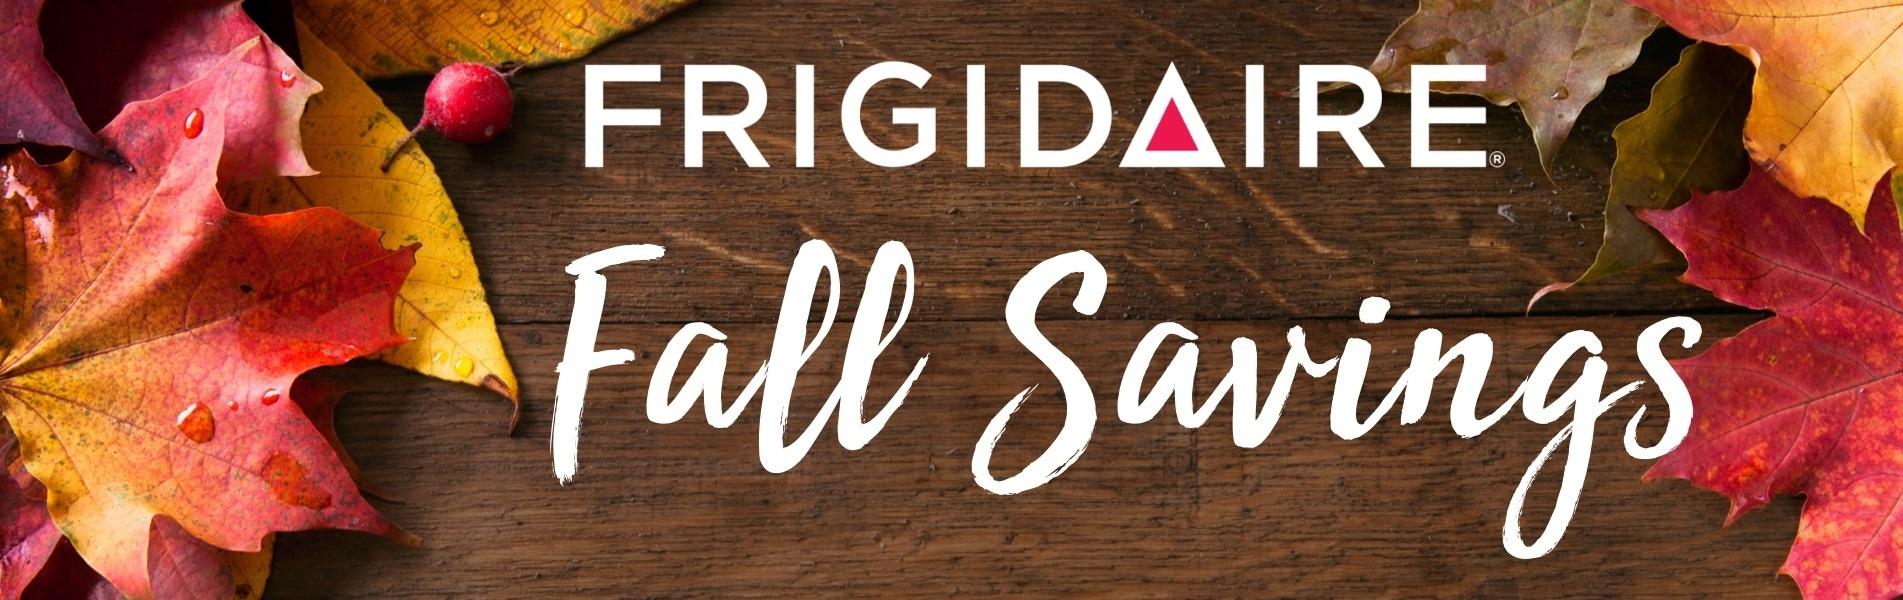 Frigidaire Fall Savings 2021